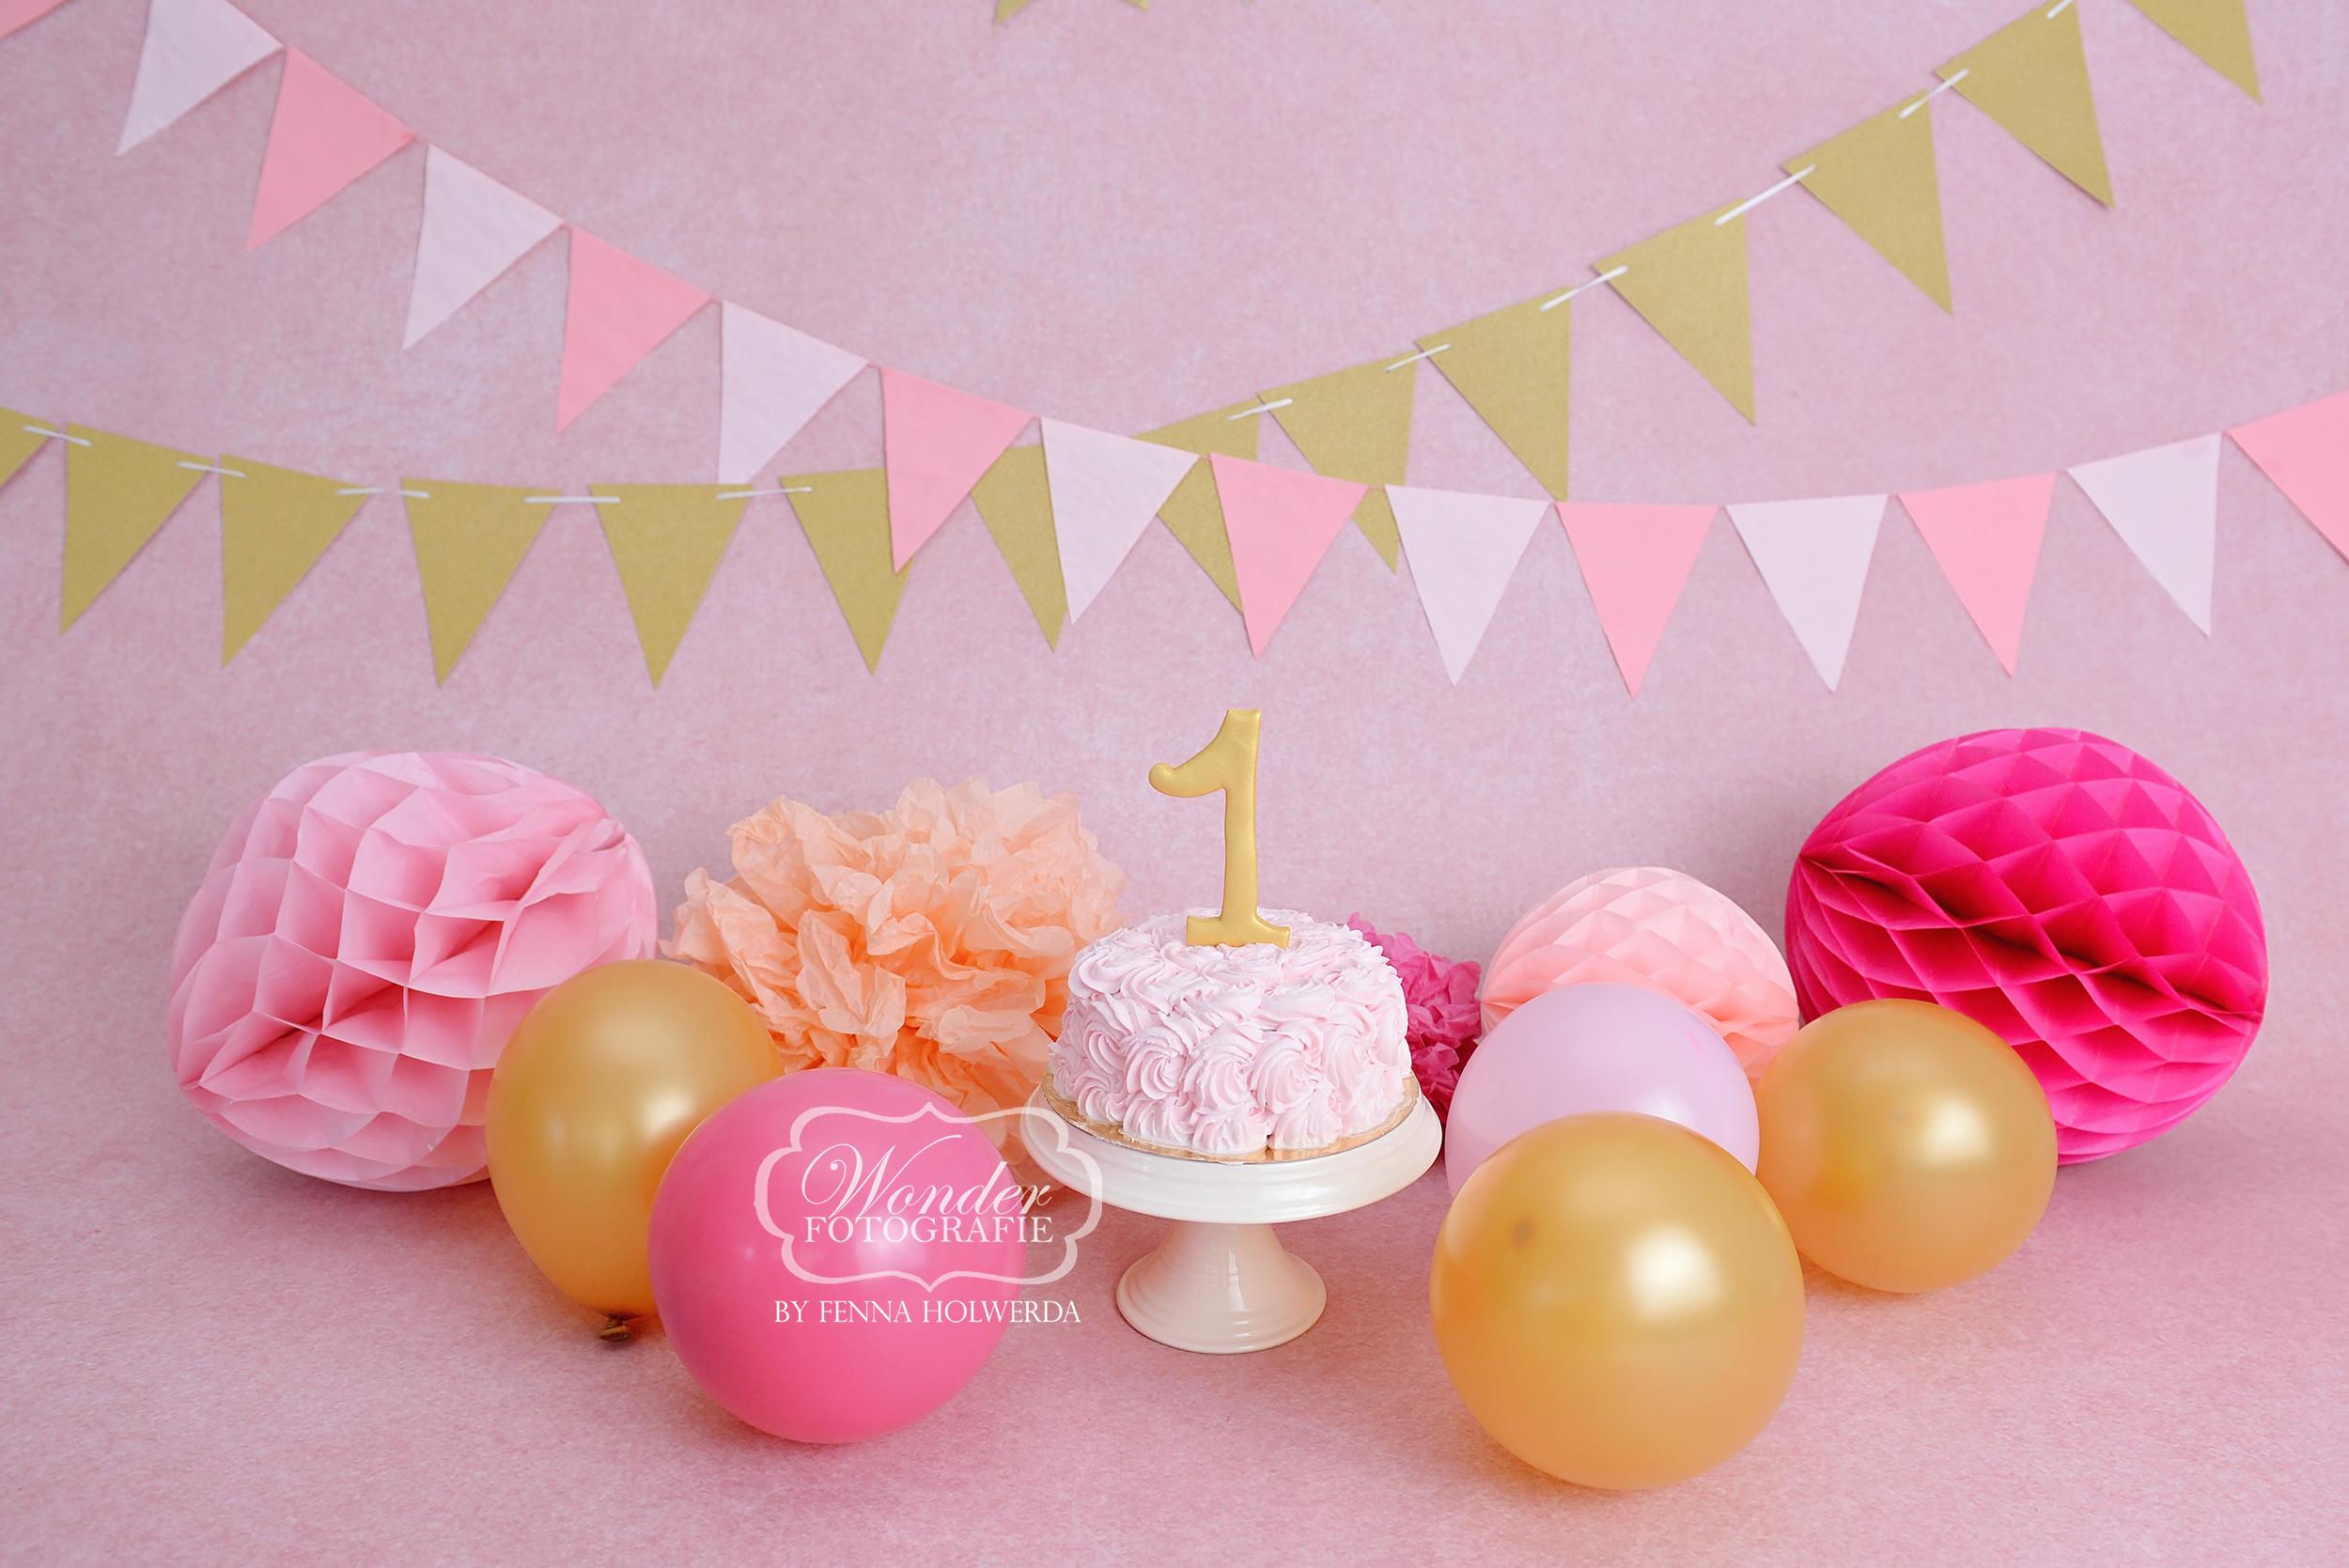 cake smash fotoshoot roze meisje doorlopende achtergrond wonder fotografie